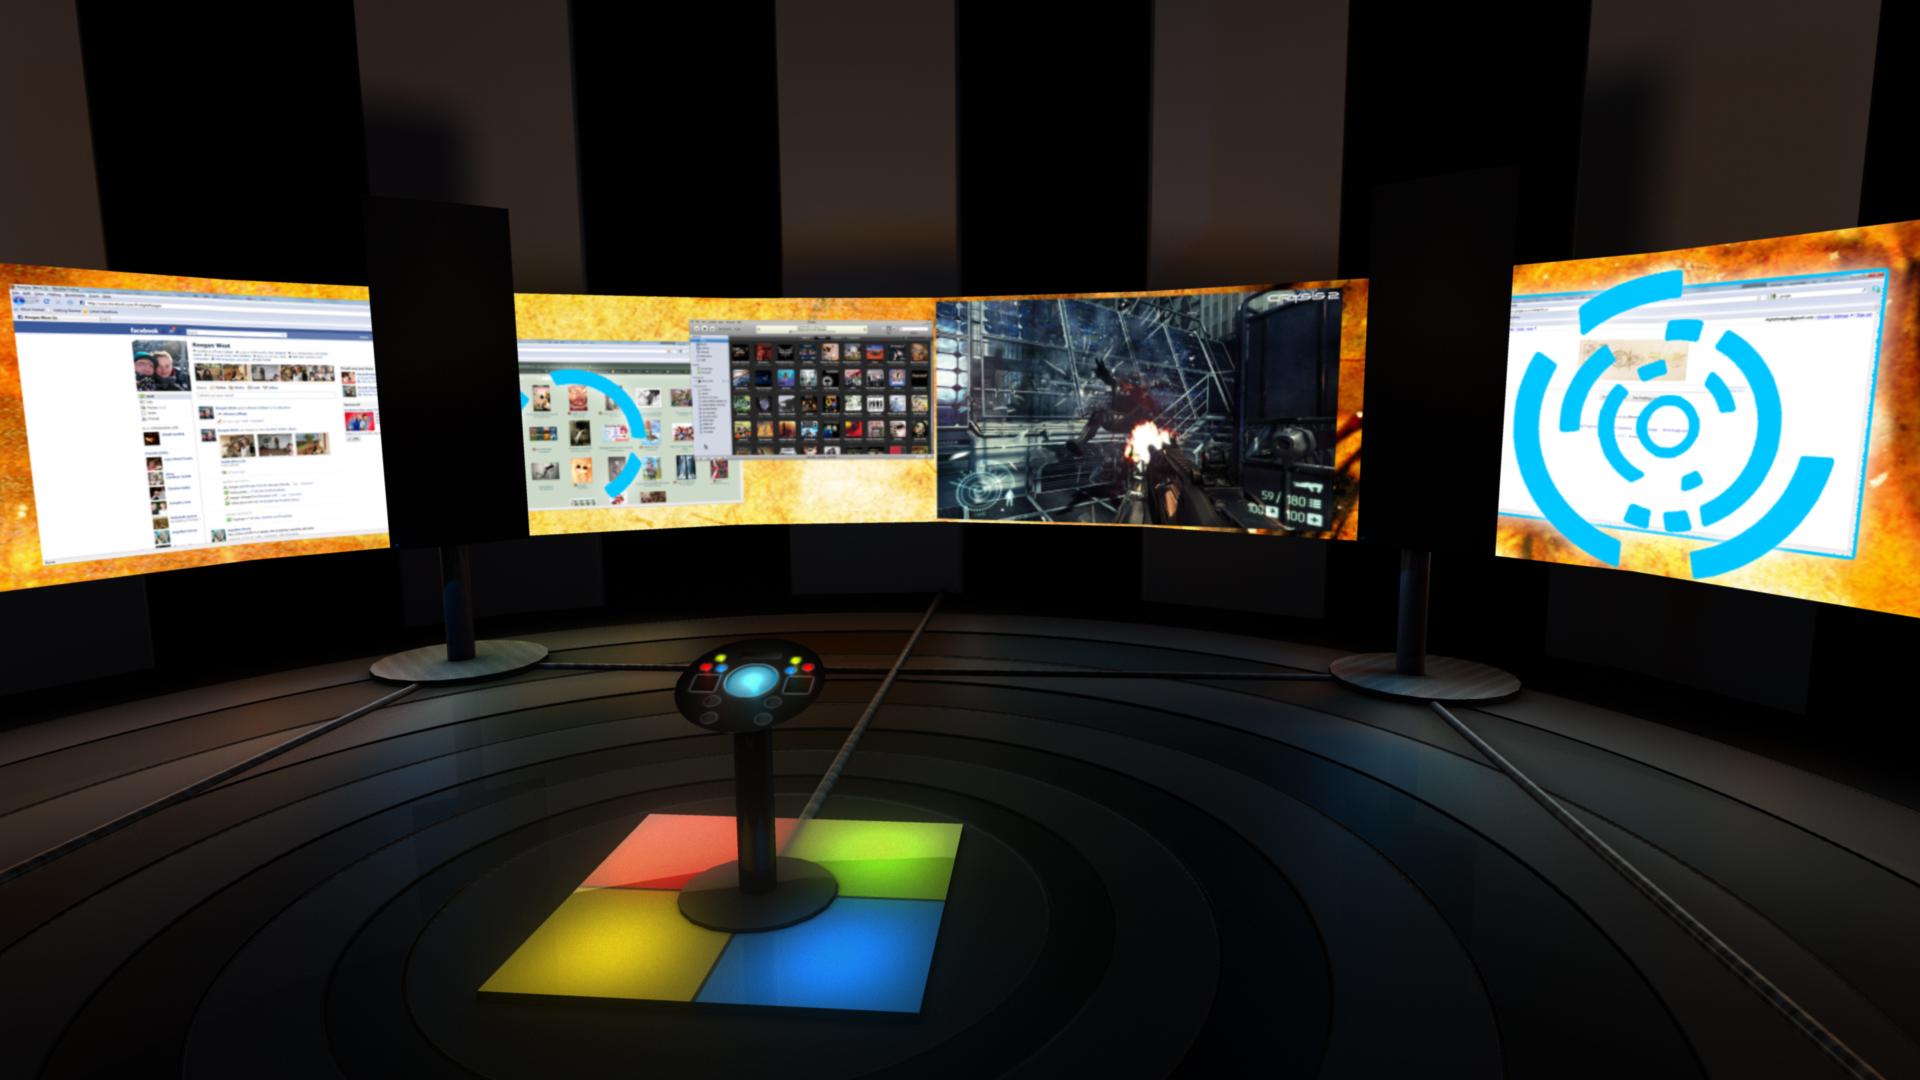 Super Gaming Computer Room